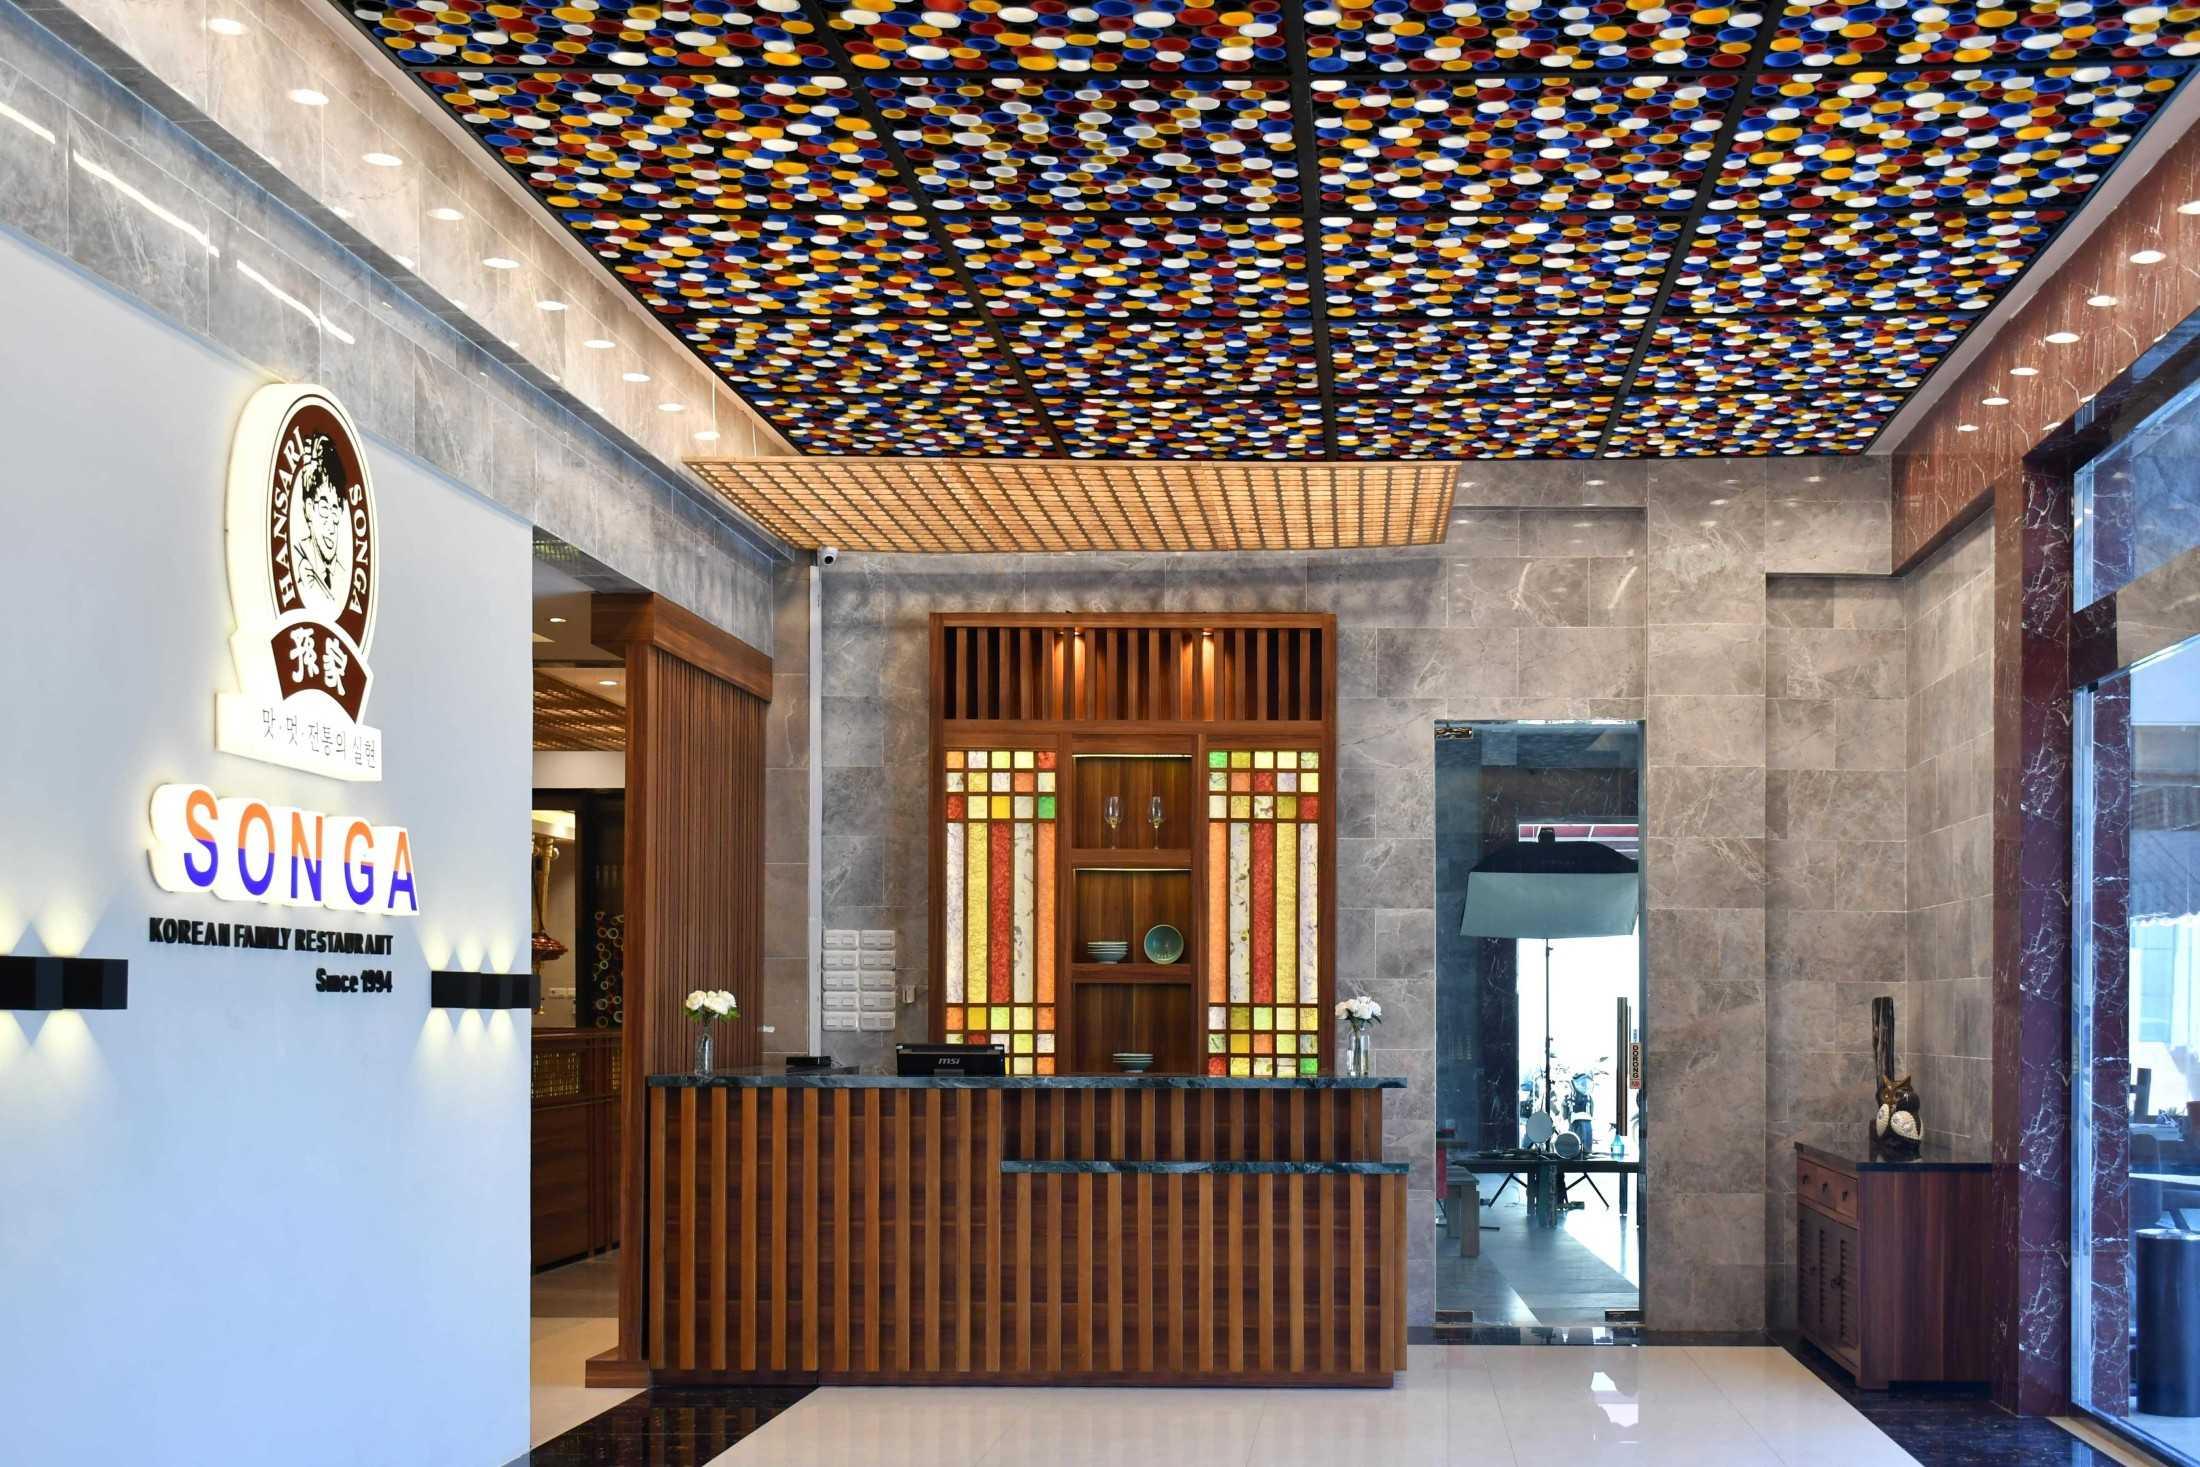 Livien Interior Songa Resto Surabaya, Kota Sby, Jawa Timur, Indonesia Surabaya, Kota Sby, Jawa Timur, Indonesia Livien-Interior-Songa-Resto  82368